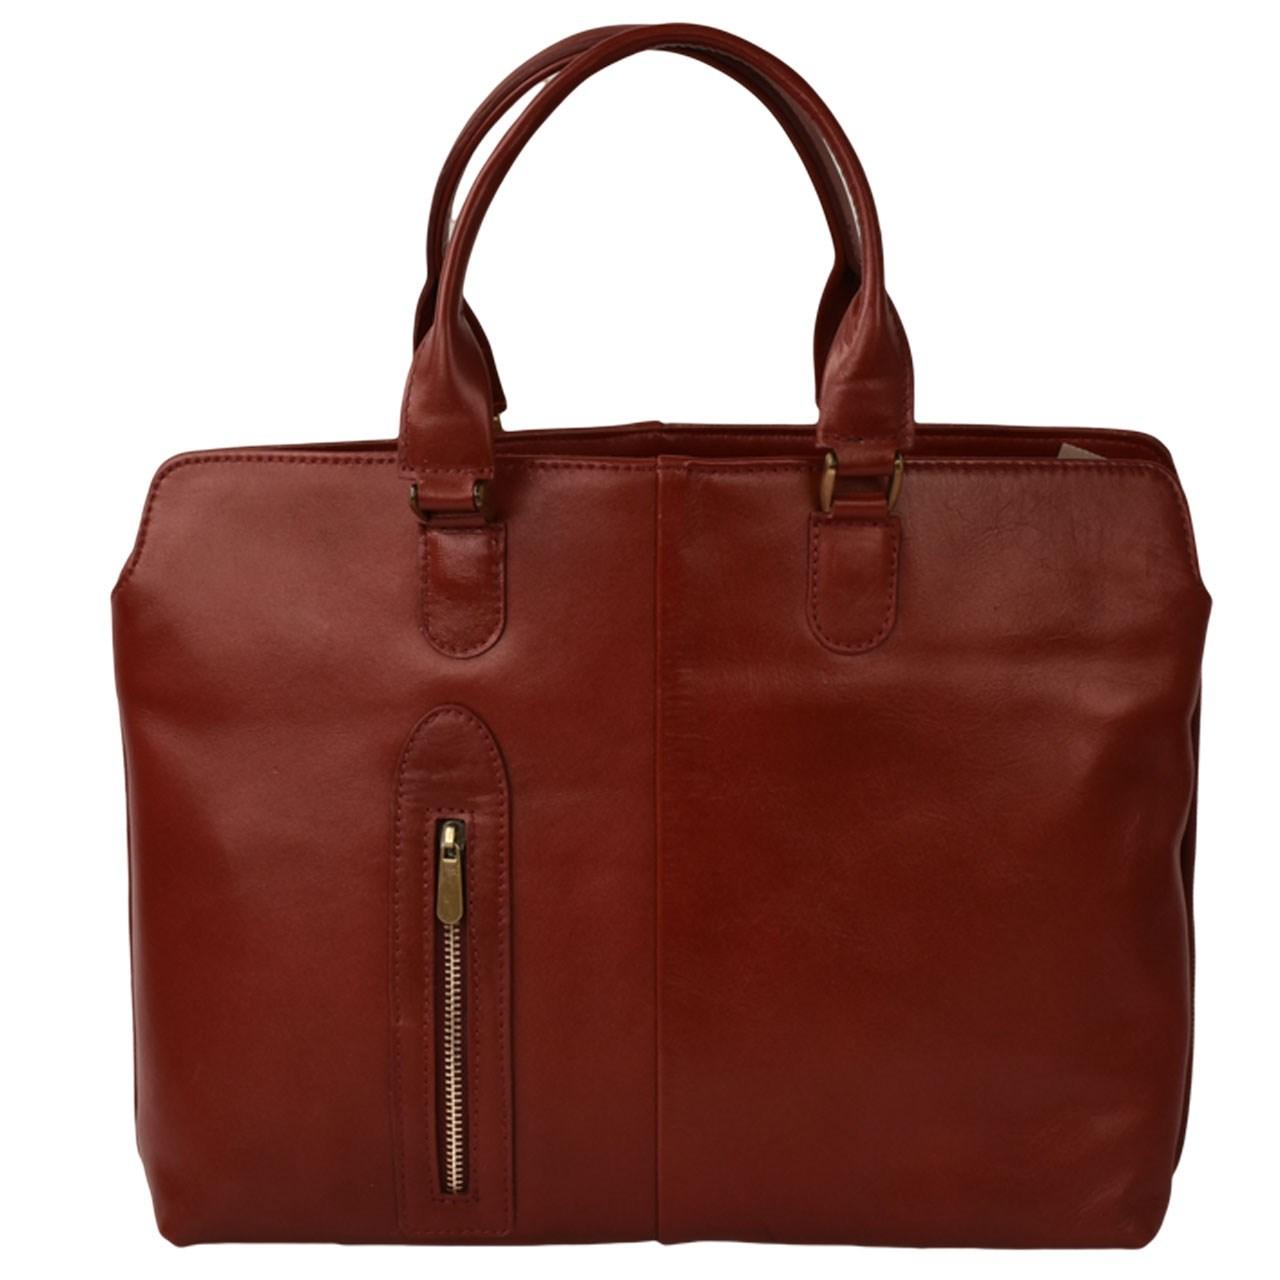 کیف دستی چرم طبیعی کهن چرم مدل V150